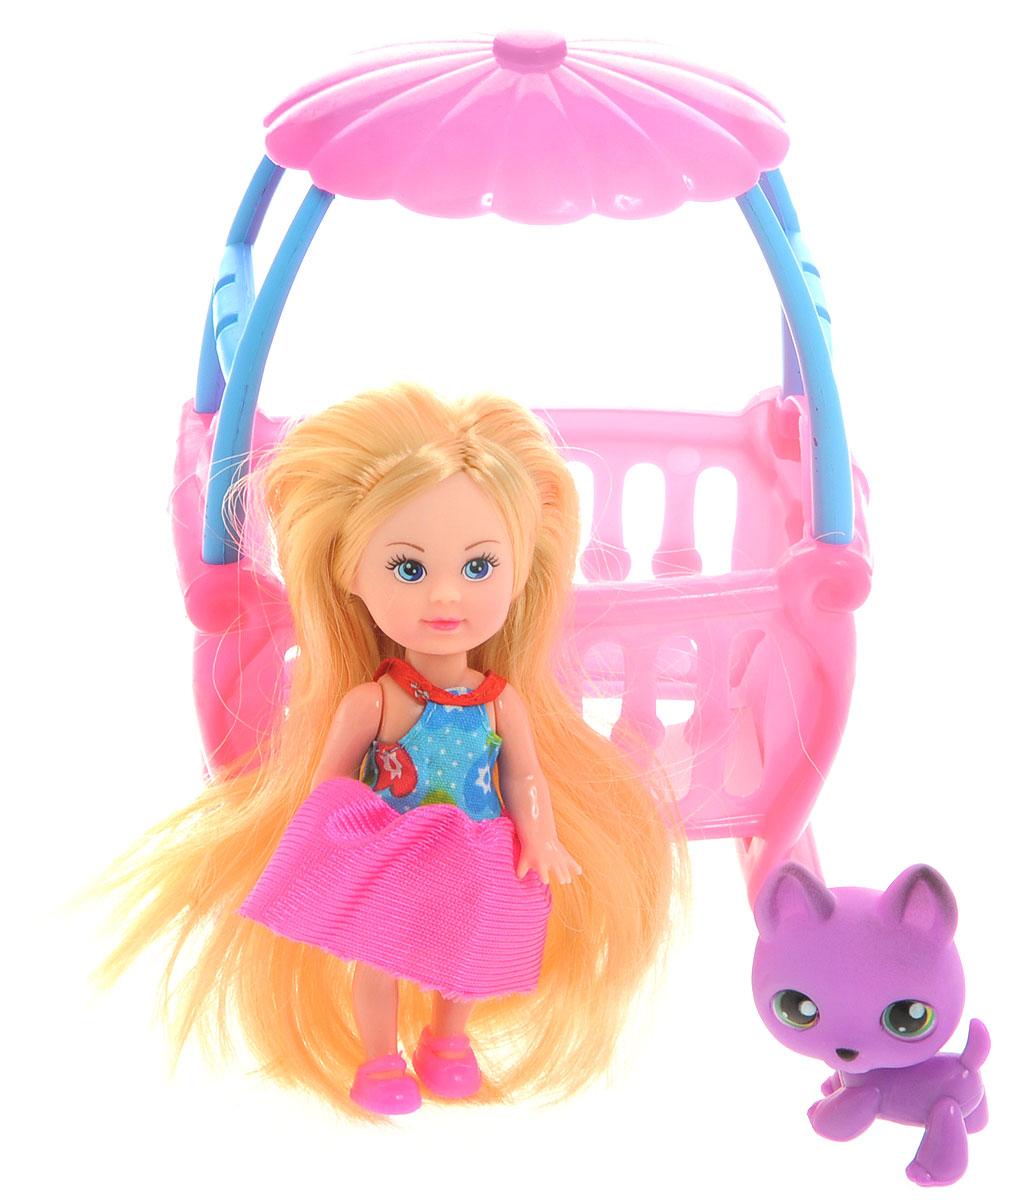 Mary Poppins Мини-кукла Малютка Мэгги с кроваткой кукла мэгги